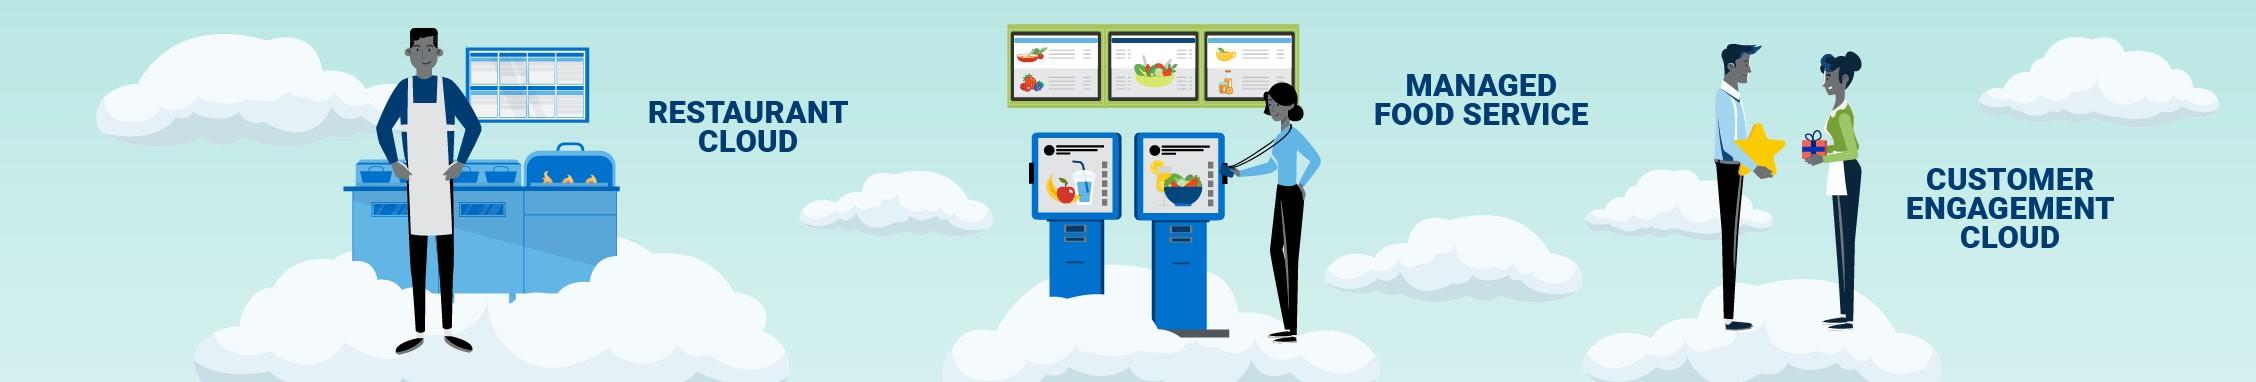 Xenial – Cloud Based Restaurant Management Platform | LinkedIn